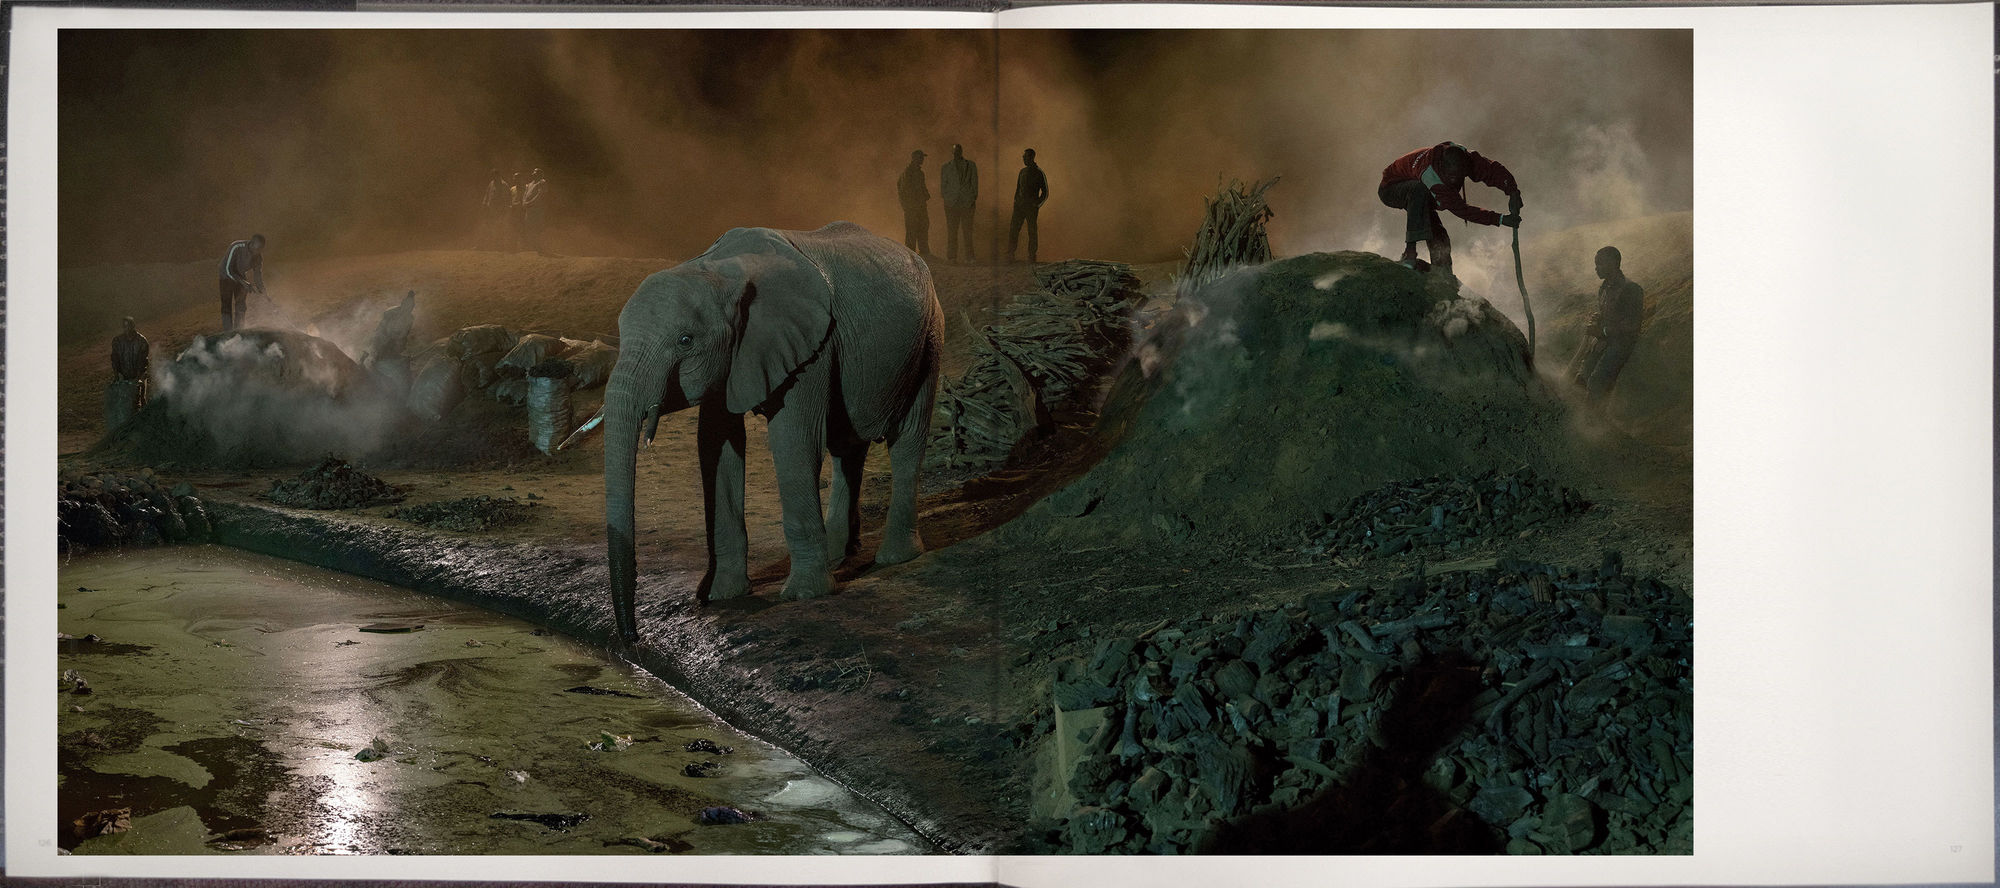 NICK BRANDT 'THIS EMPTY WORLD' (Thames & Hudson)